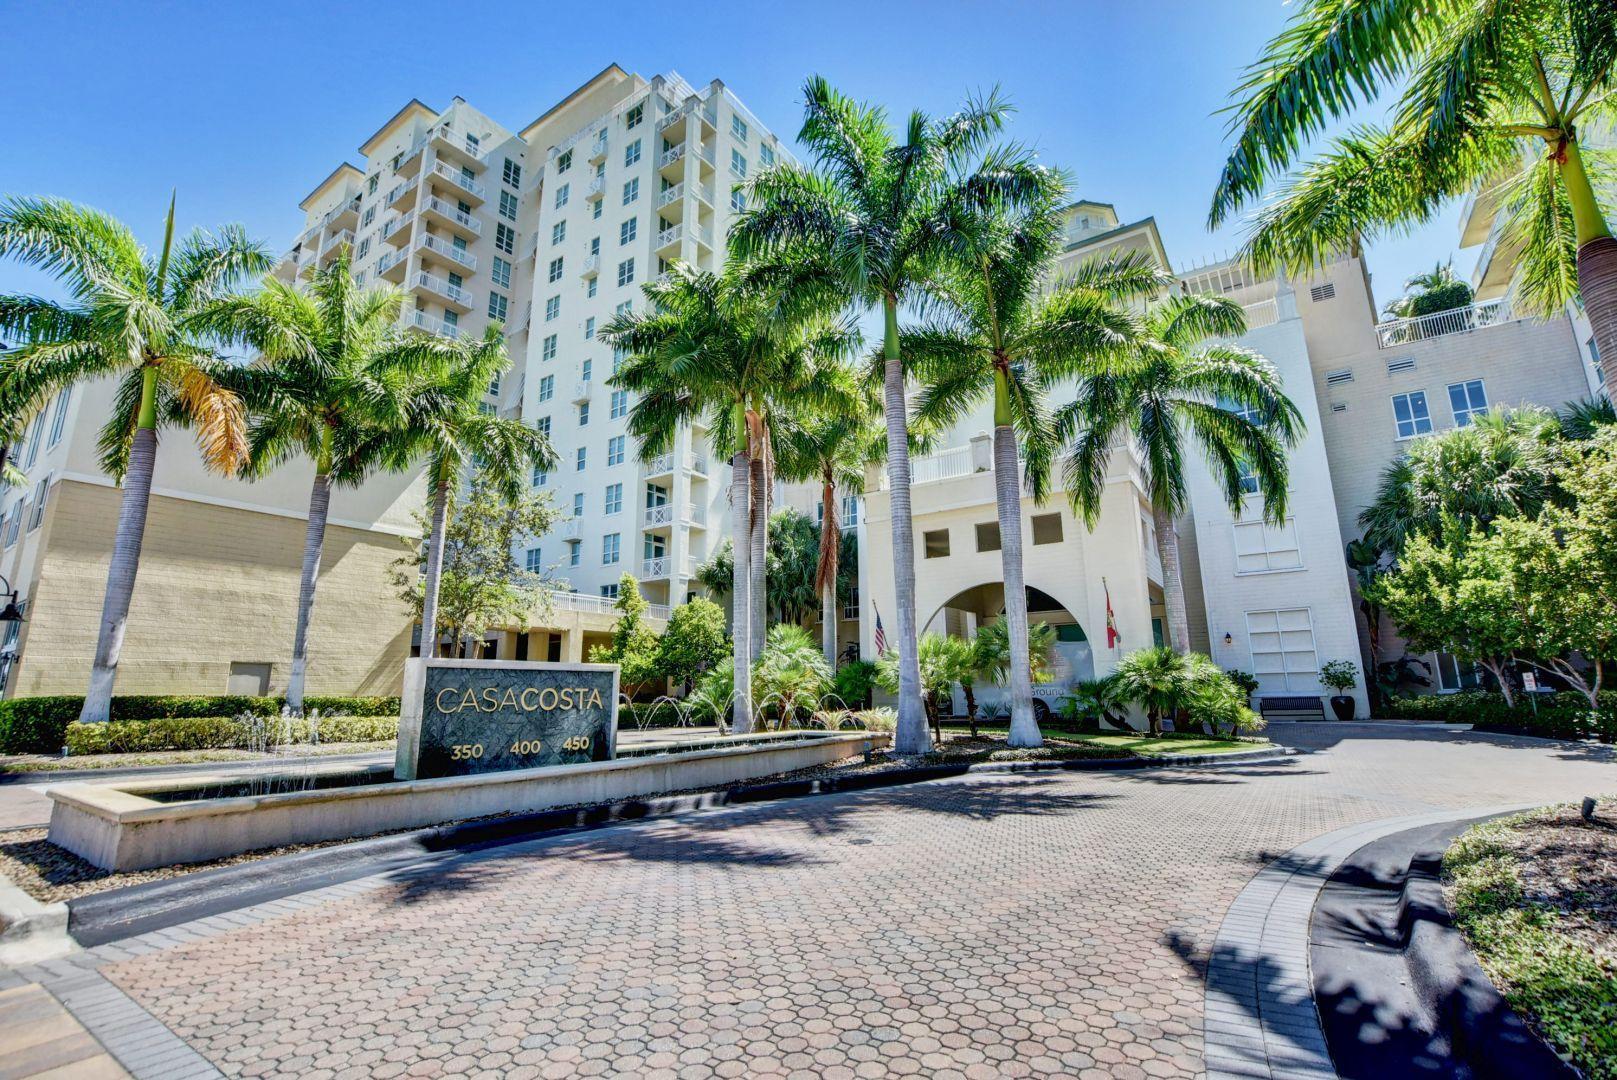 Casa Costa Luxury Waterfront Condos For Sale In Boynton Beach Florida